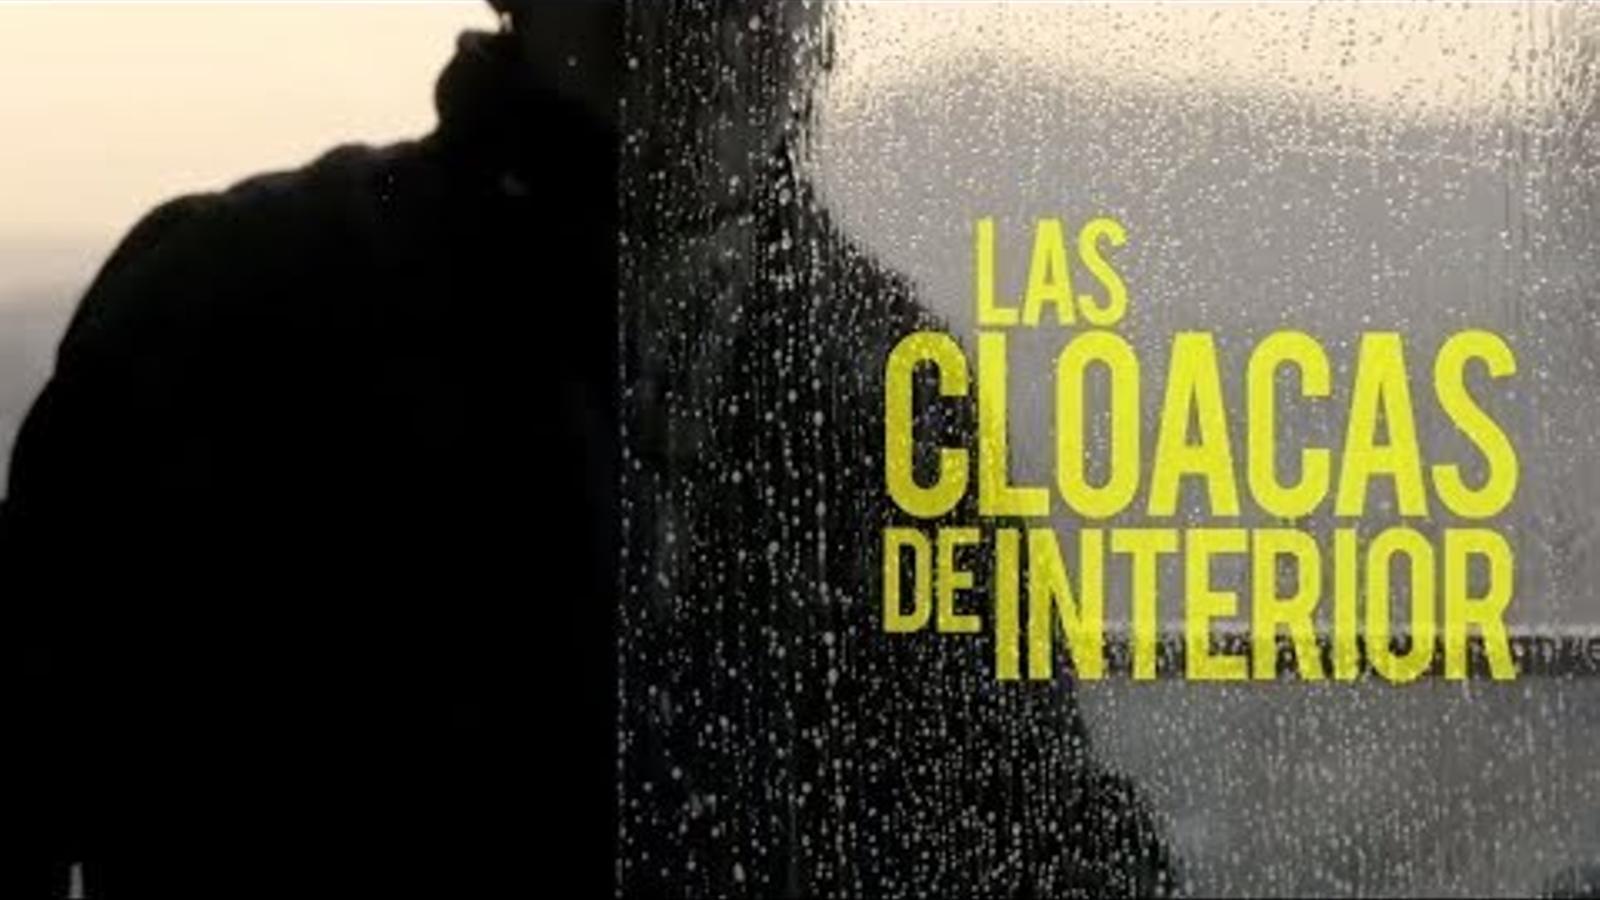 TV3 reemetrà 'Las cloacas de Interior' dissabte al vespre